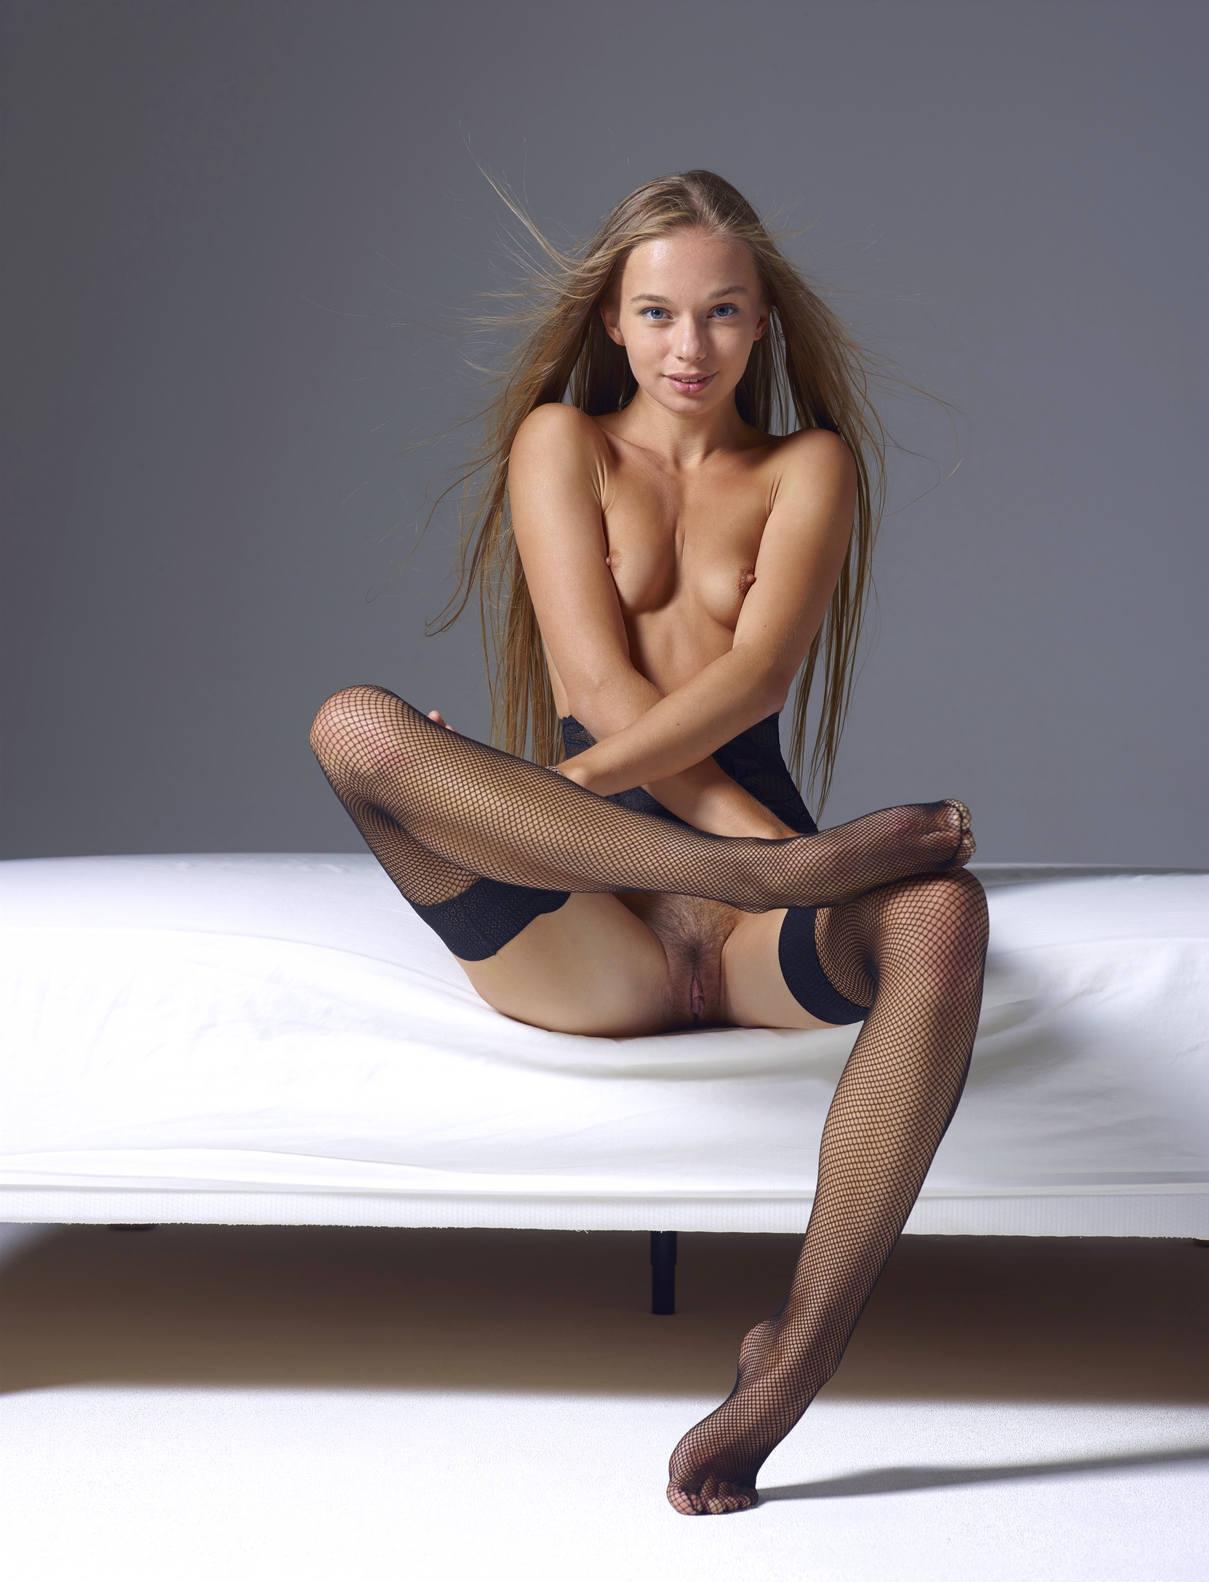 Female body builder pussy